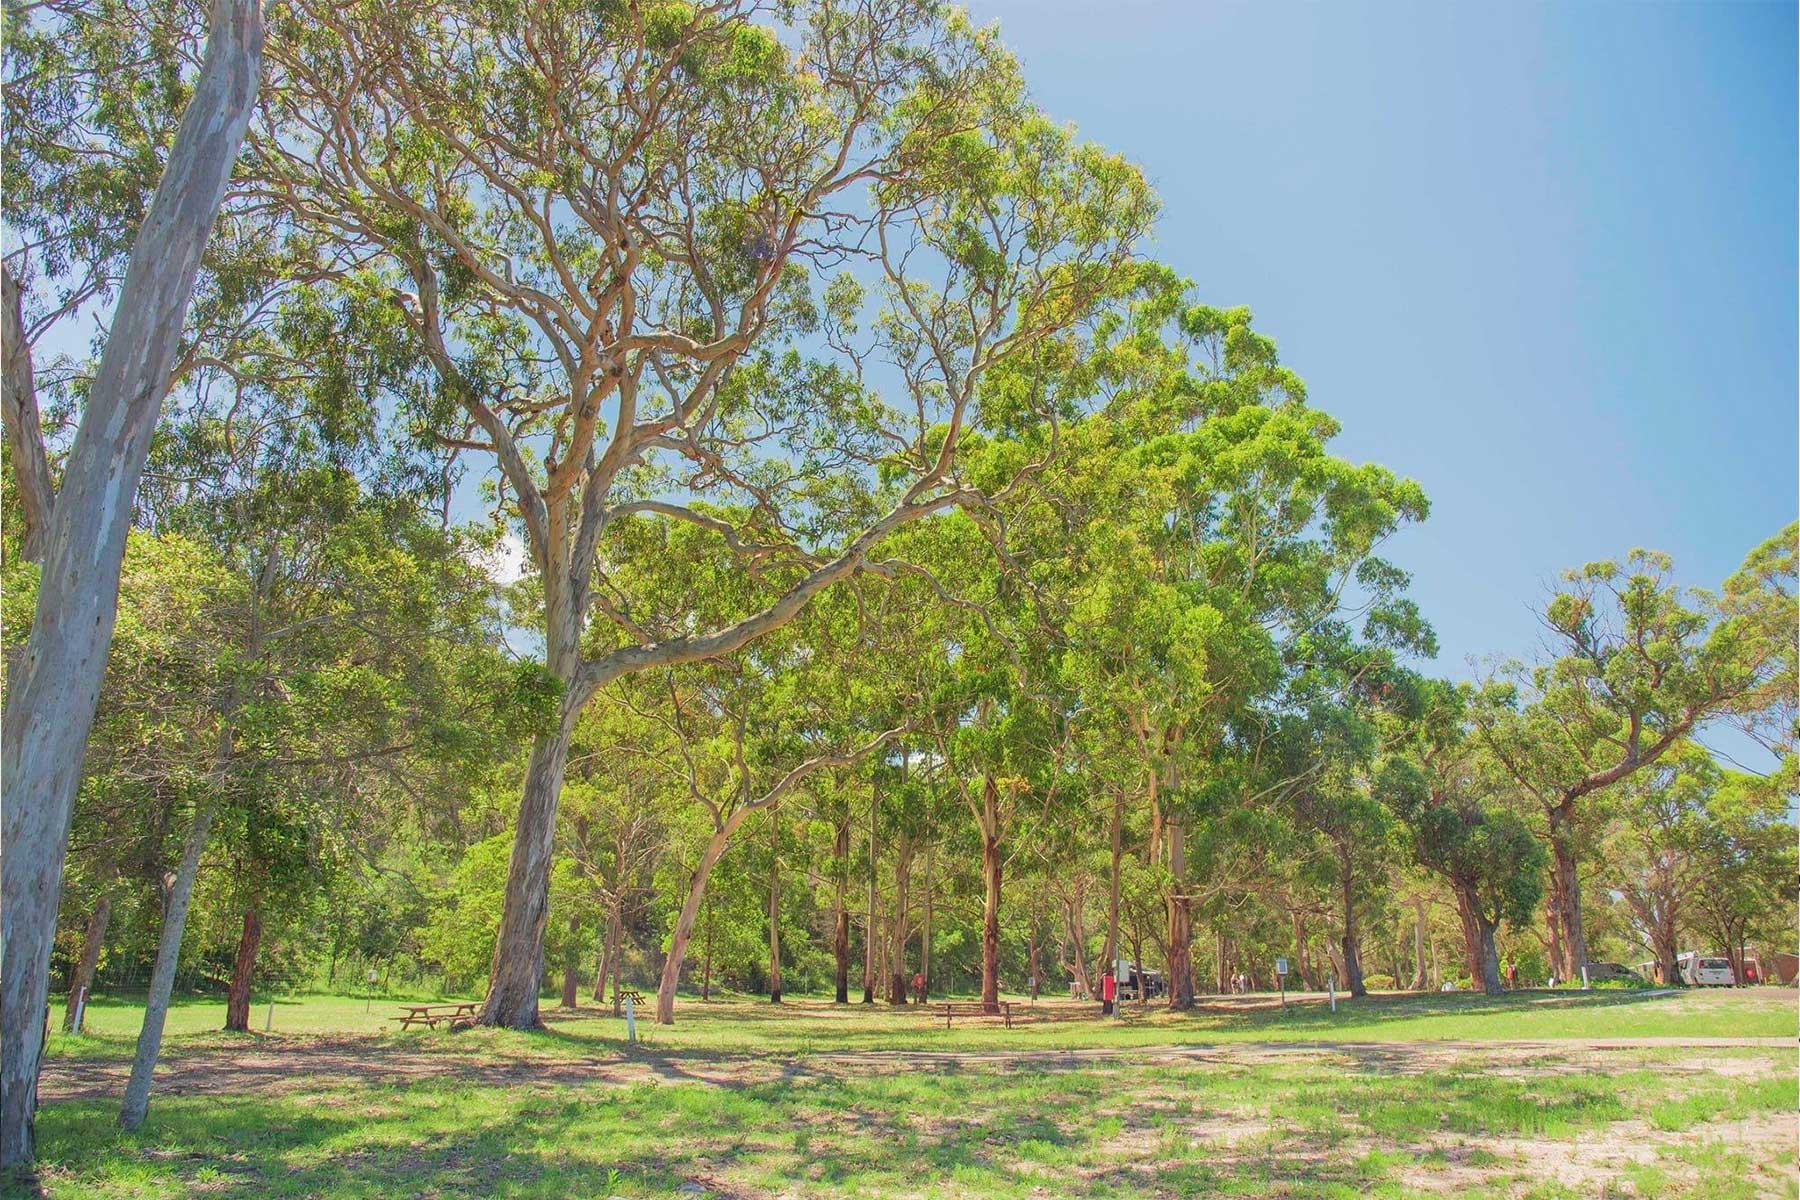 Beachfront Caravan Sites - Accommodation - Cabins- Glamping - Camping - Caravan Park - Tathra Beachside Eco Camp - NSW Sapphire, South Coast